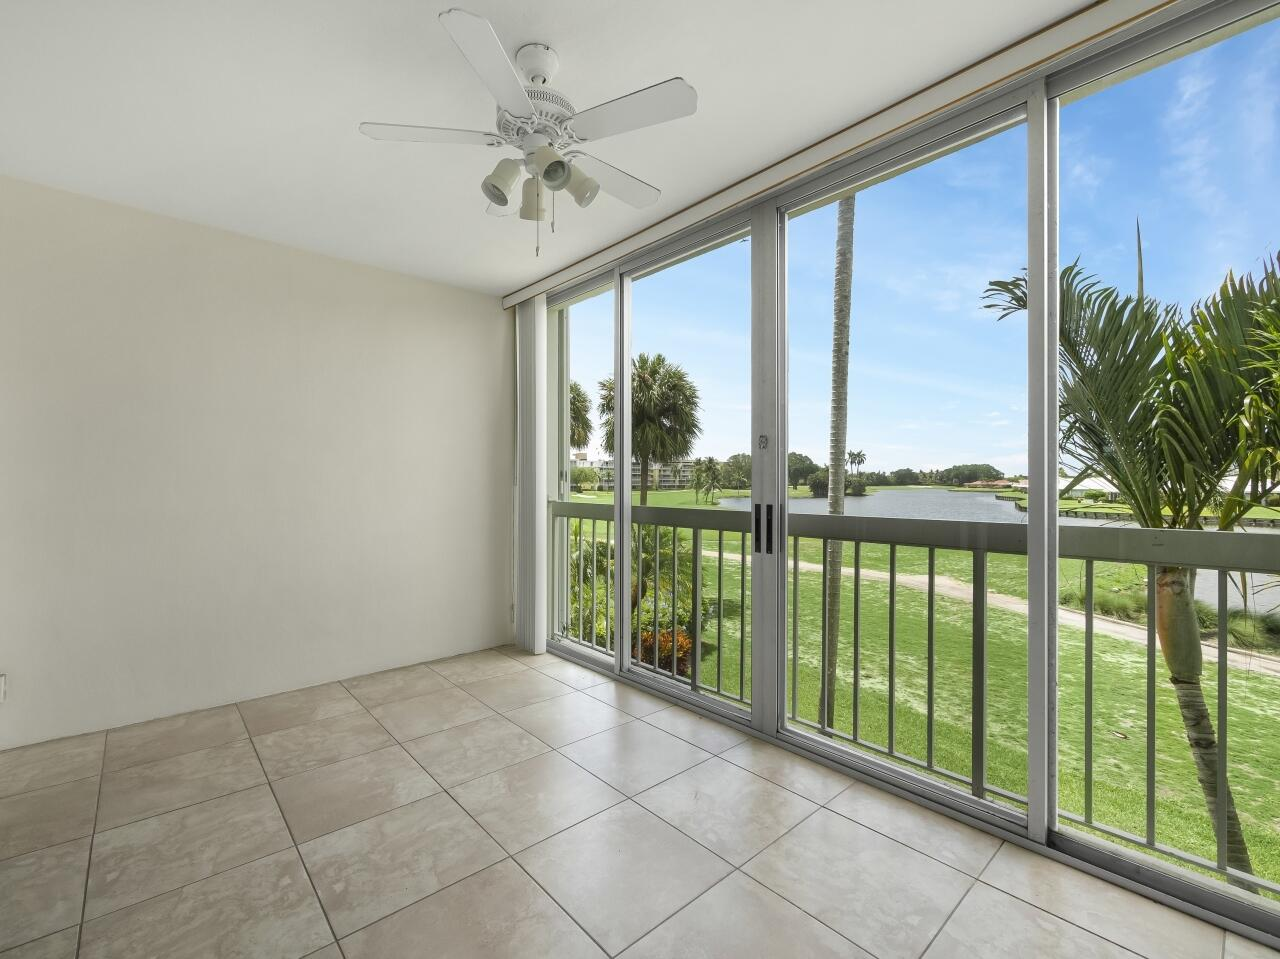 Home for sale in Atlantis Regency Condo Atlantis Florida